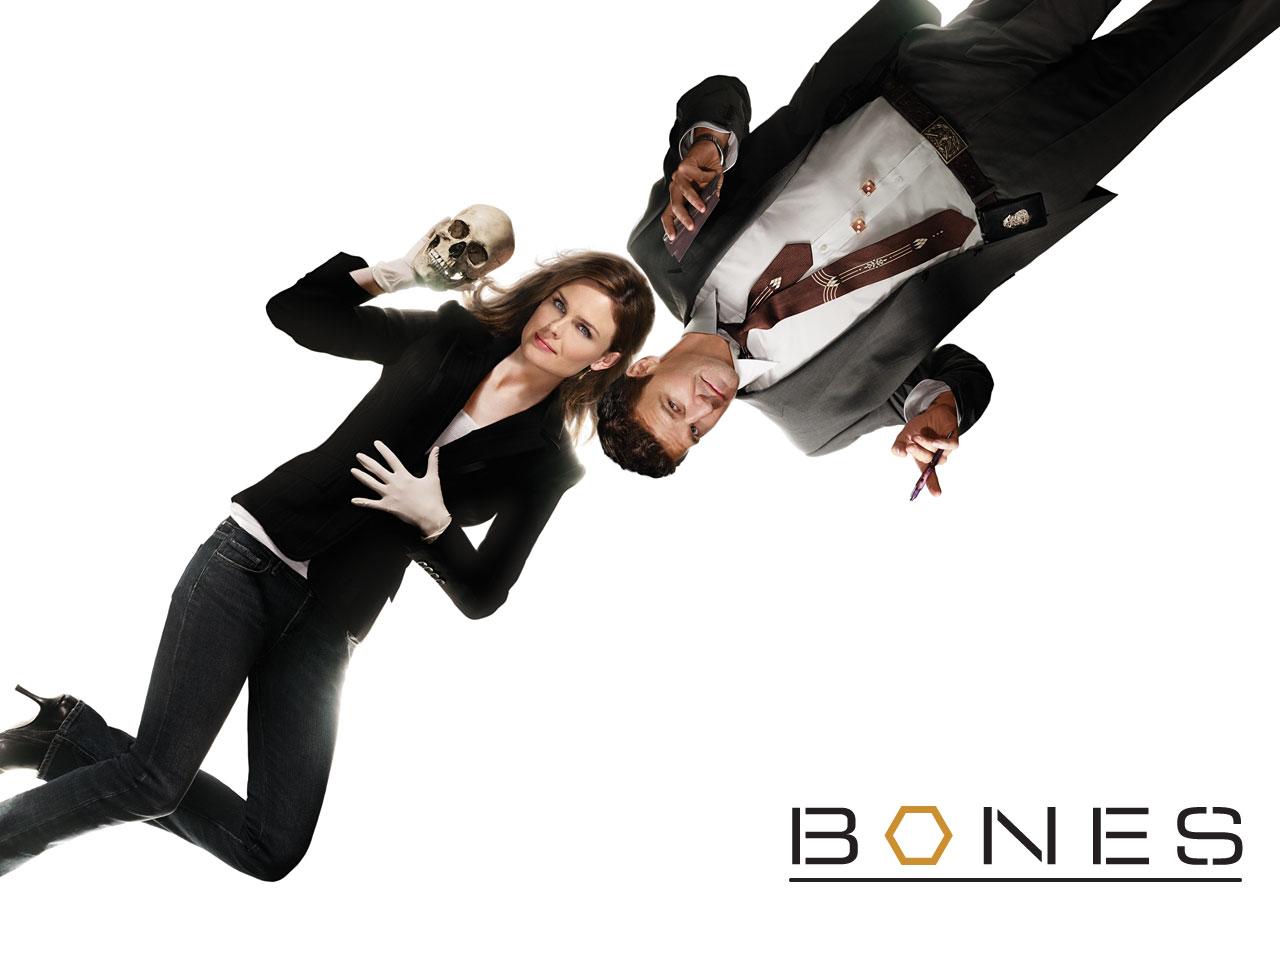 https://i2.wp.com/1.bp.blogspot.com/_DvKhdNIxfgE/TNOAwgdxuRI/AAAAAAAACao/mindipHhYH8/s1600/10-Bones.jpg?resize=510%2C382